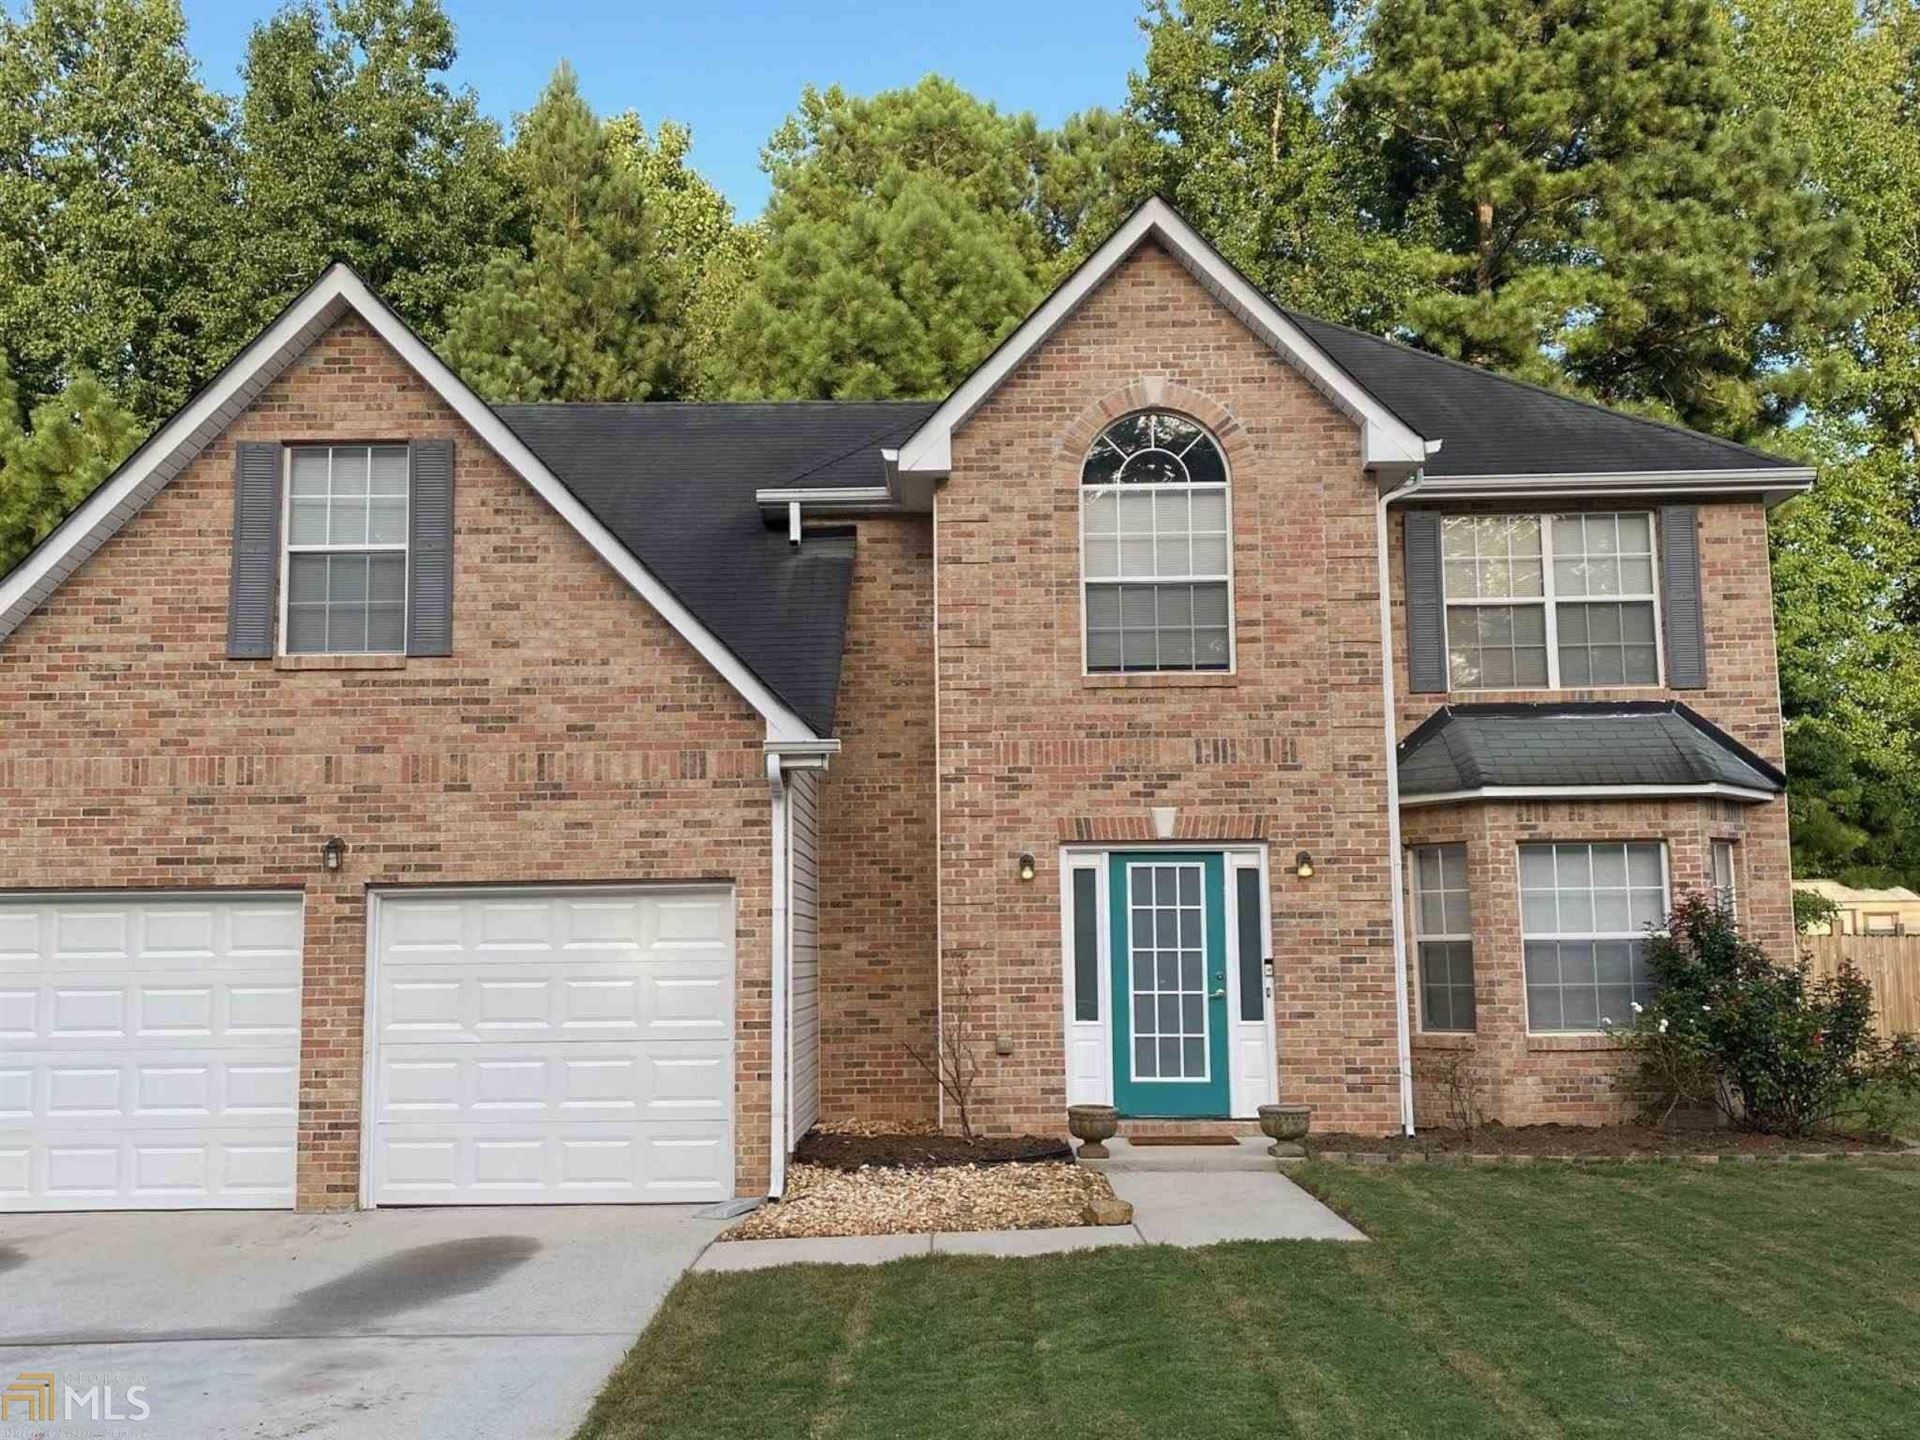 1861 Smithfield, Ellenwood, GA 30294 - MLS#: 8852479